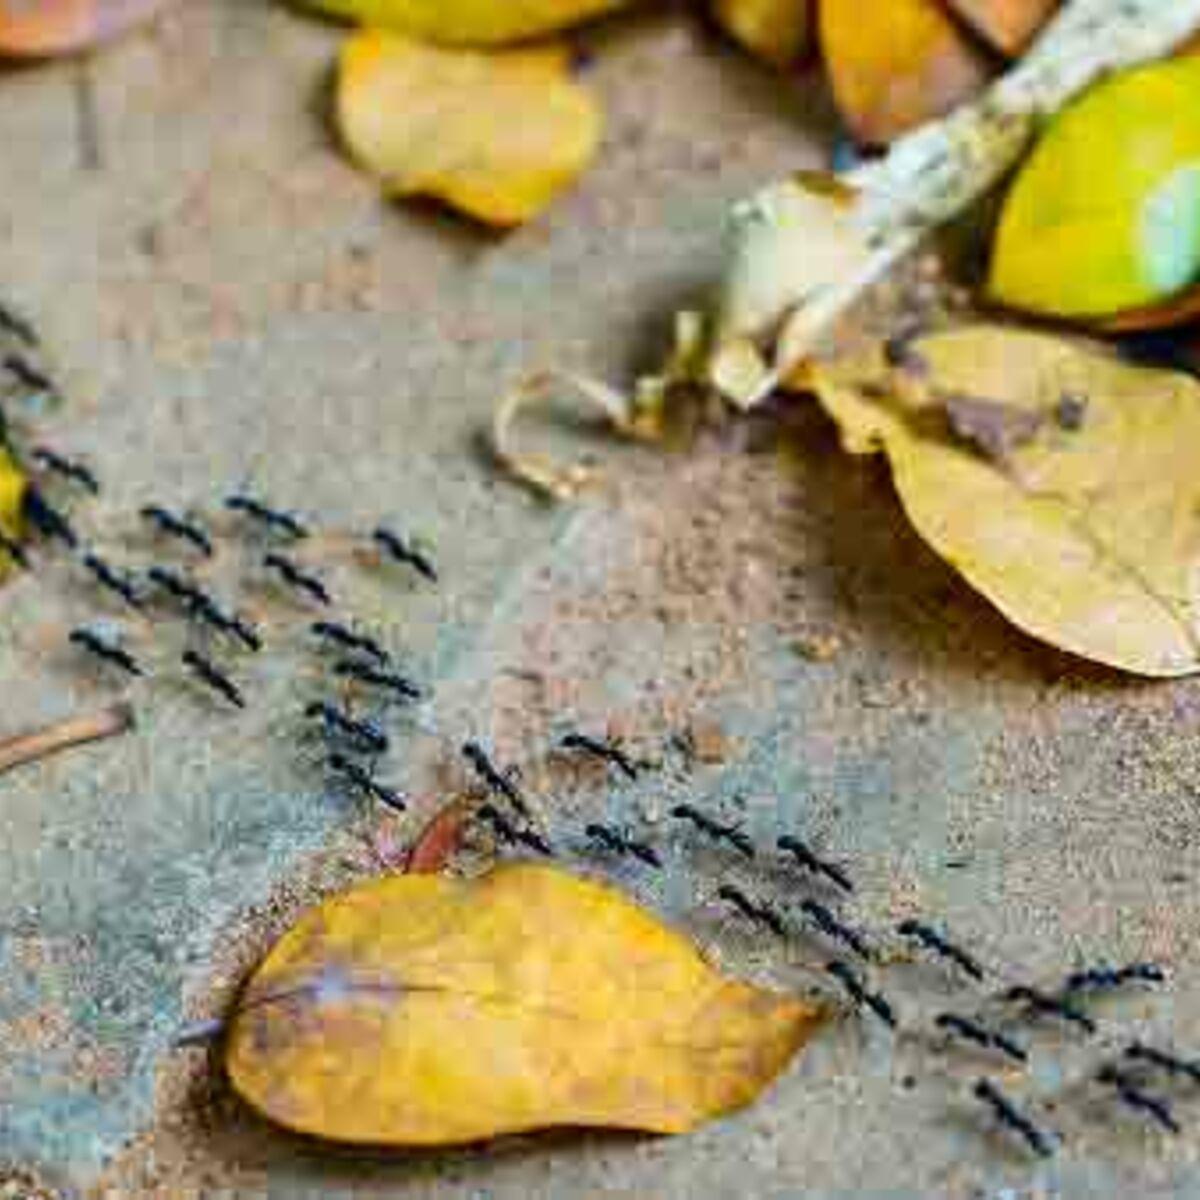 Eloigner Les Fourmis Au Jardin jardin : 10 anti-fourmis naturels et efficaces : femme